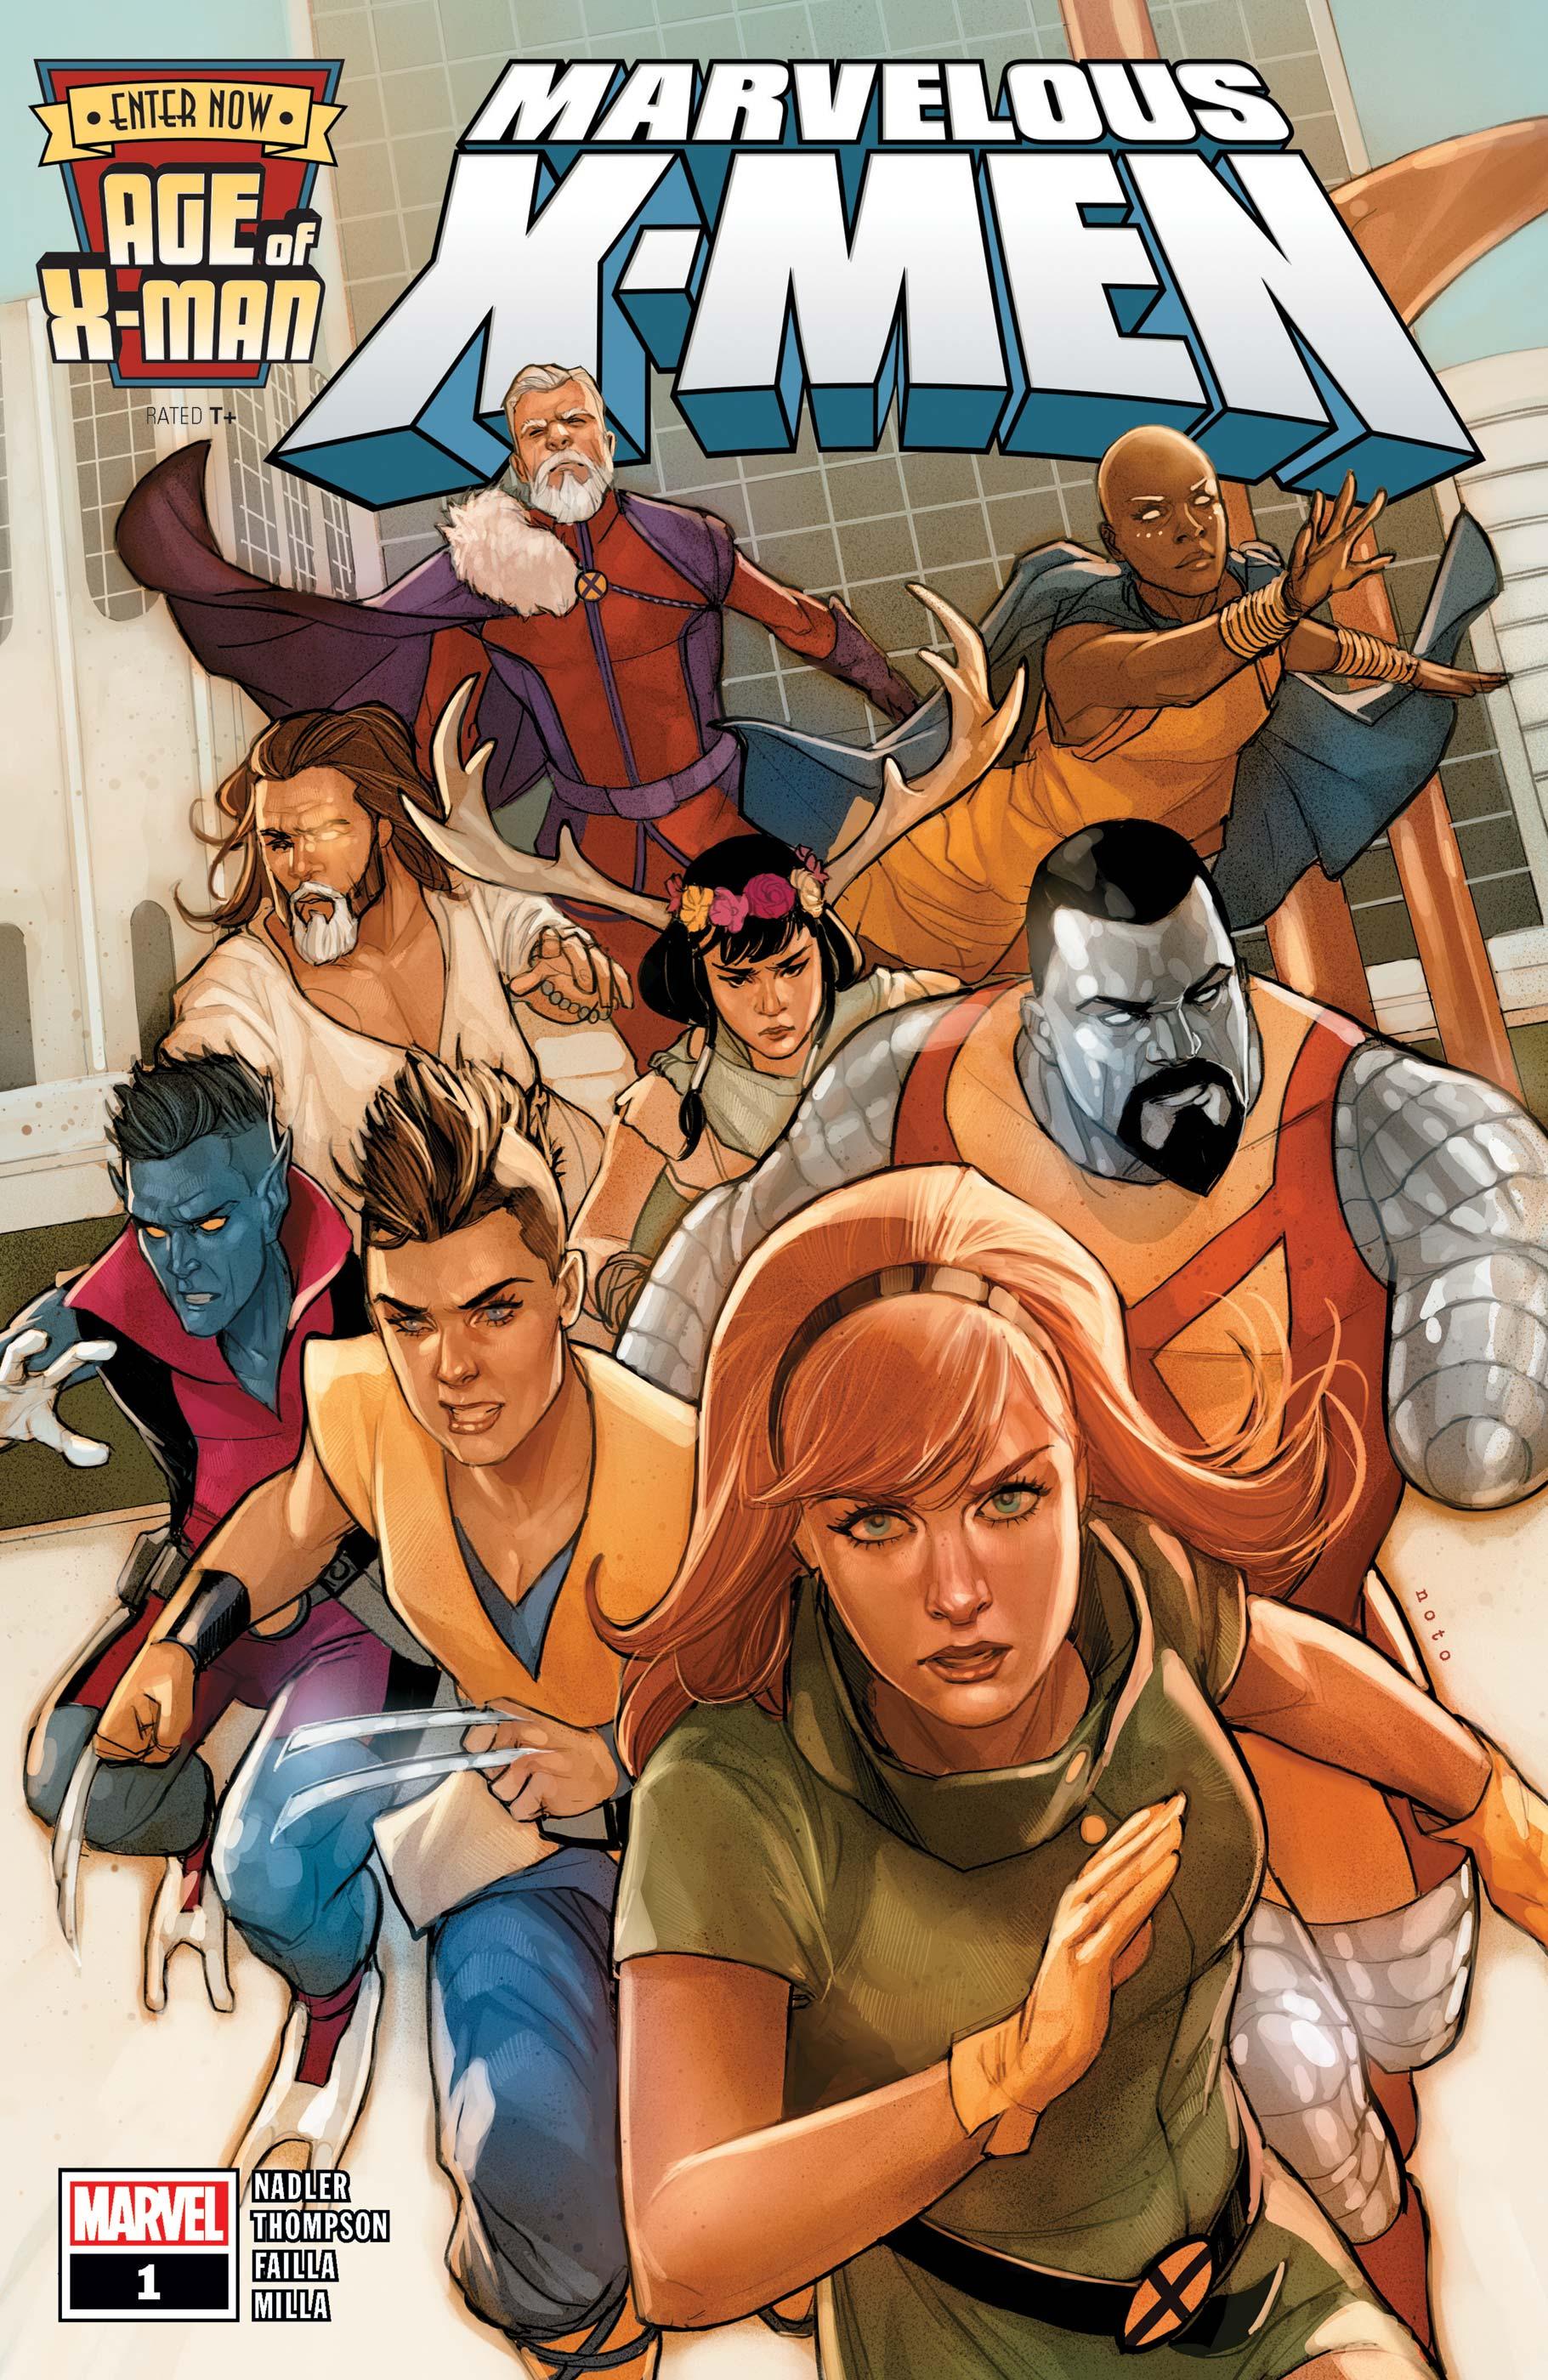 Age of X-Man: The Marvelous X-Men (2019) #1